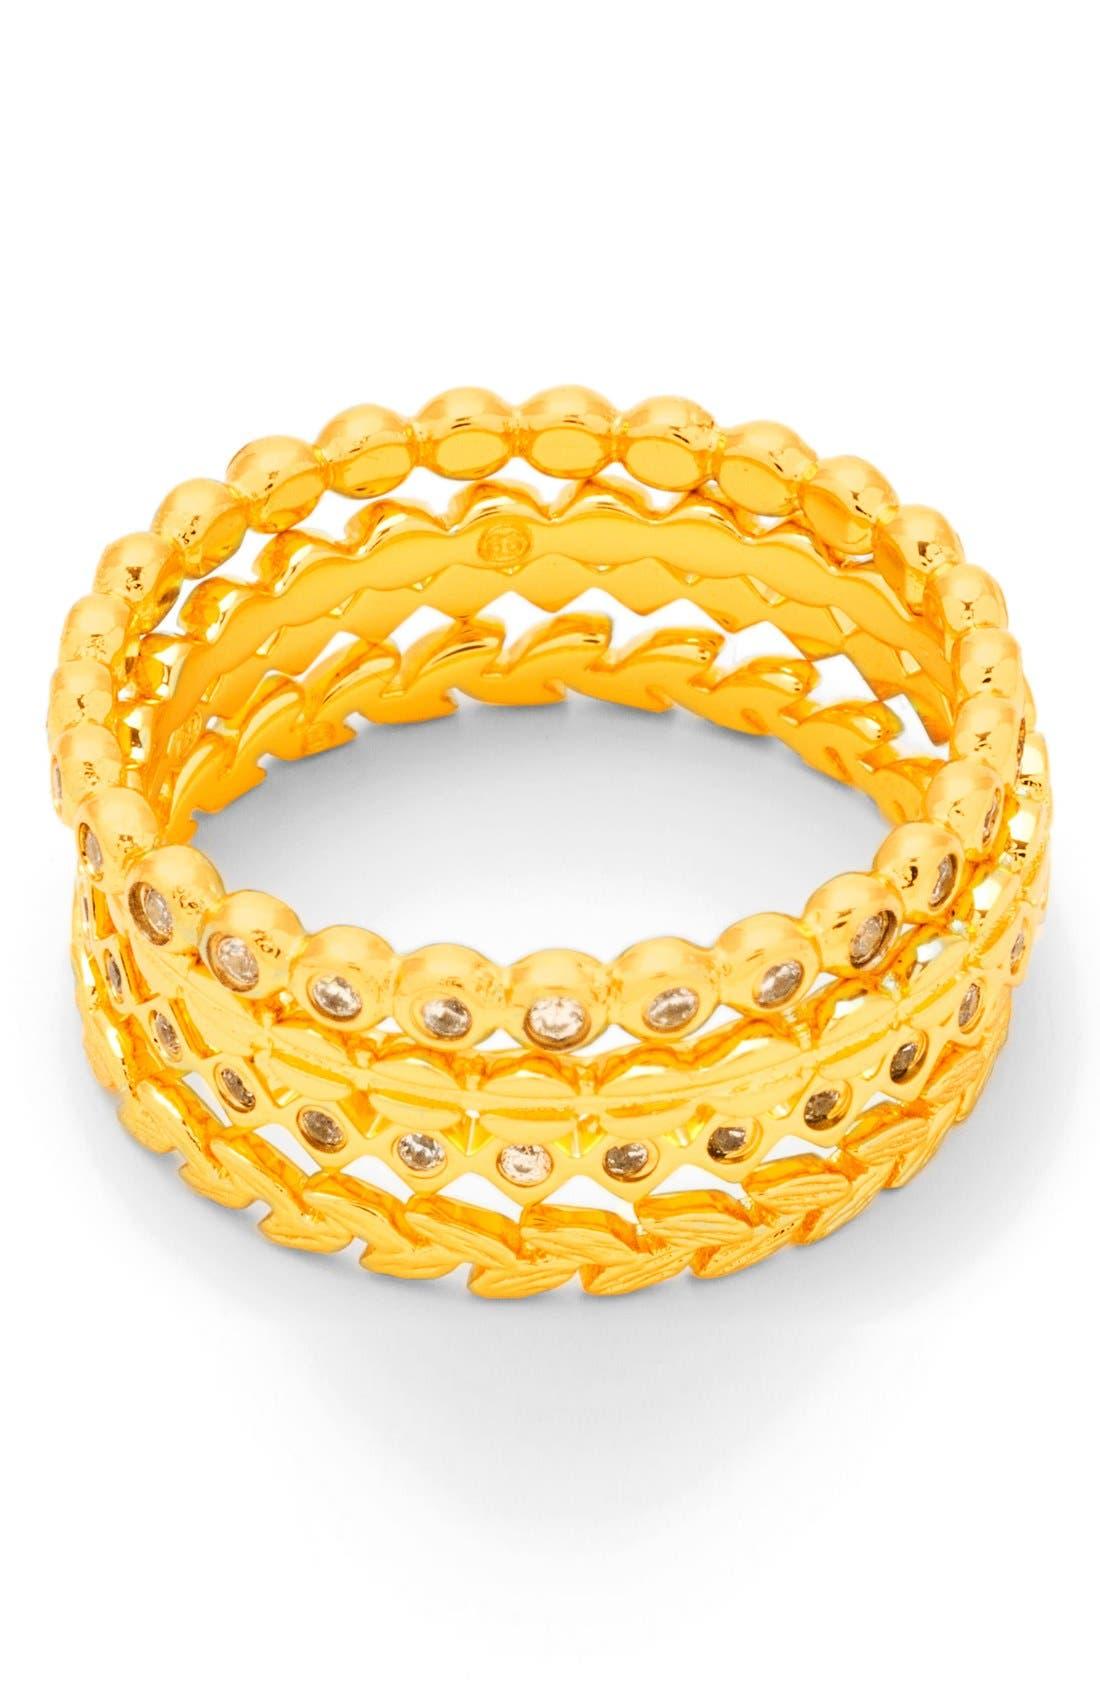 Stackable Set of 4 Band Rings,                             Main thumbnail 1, color,                             710